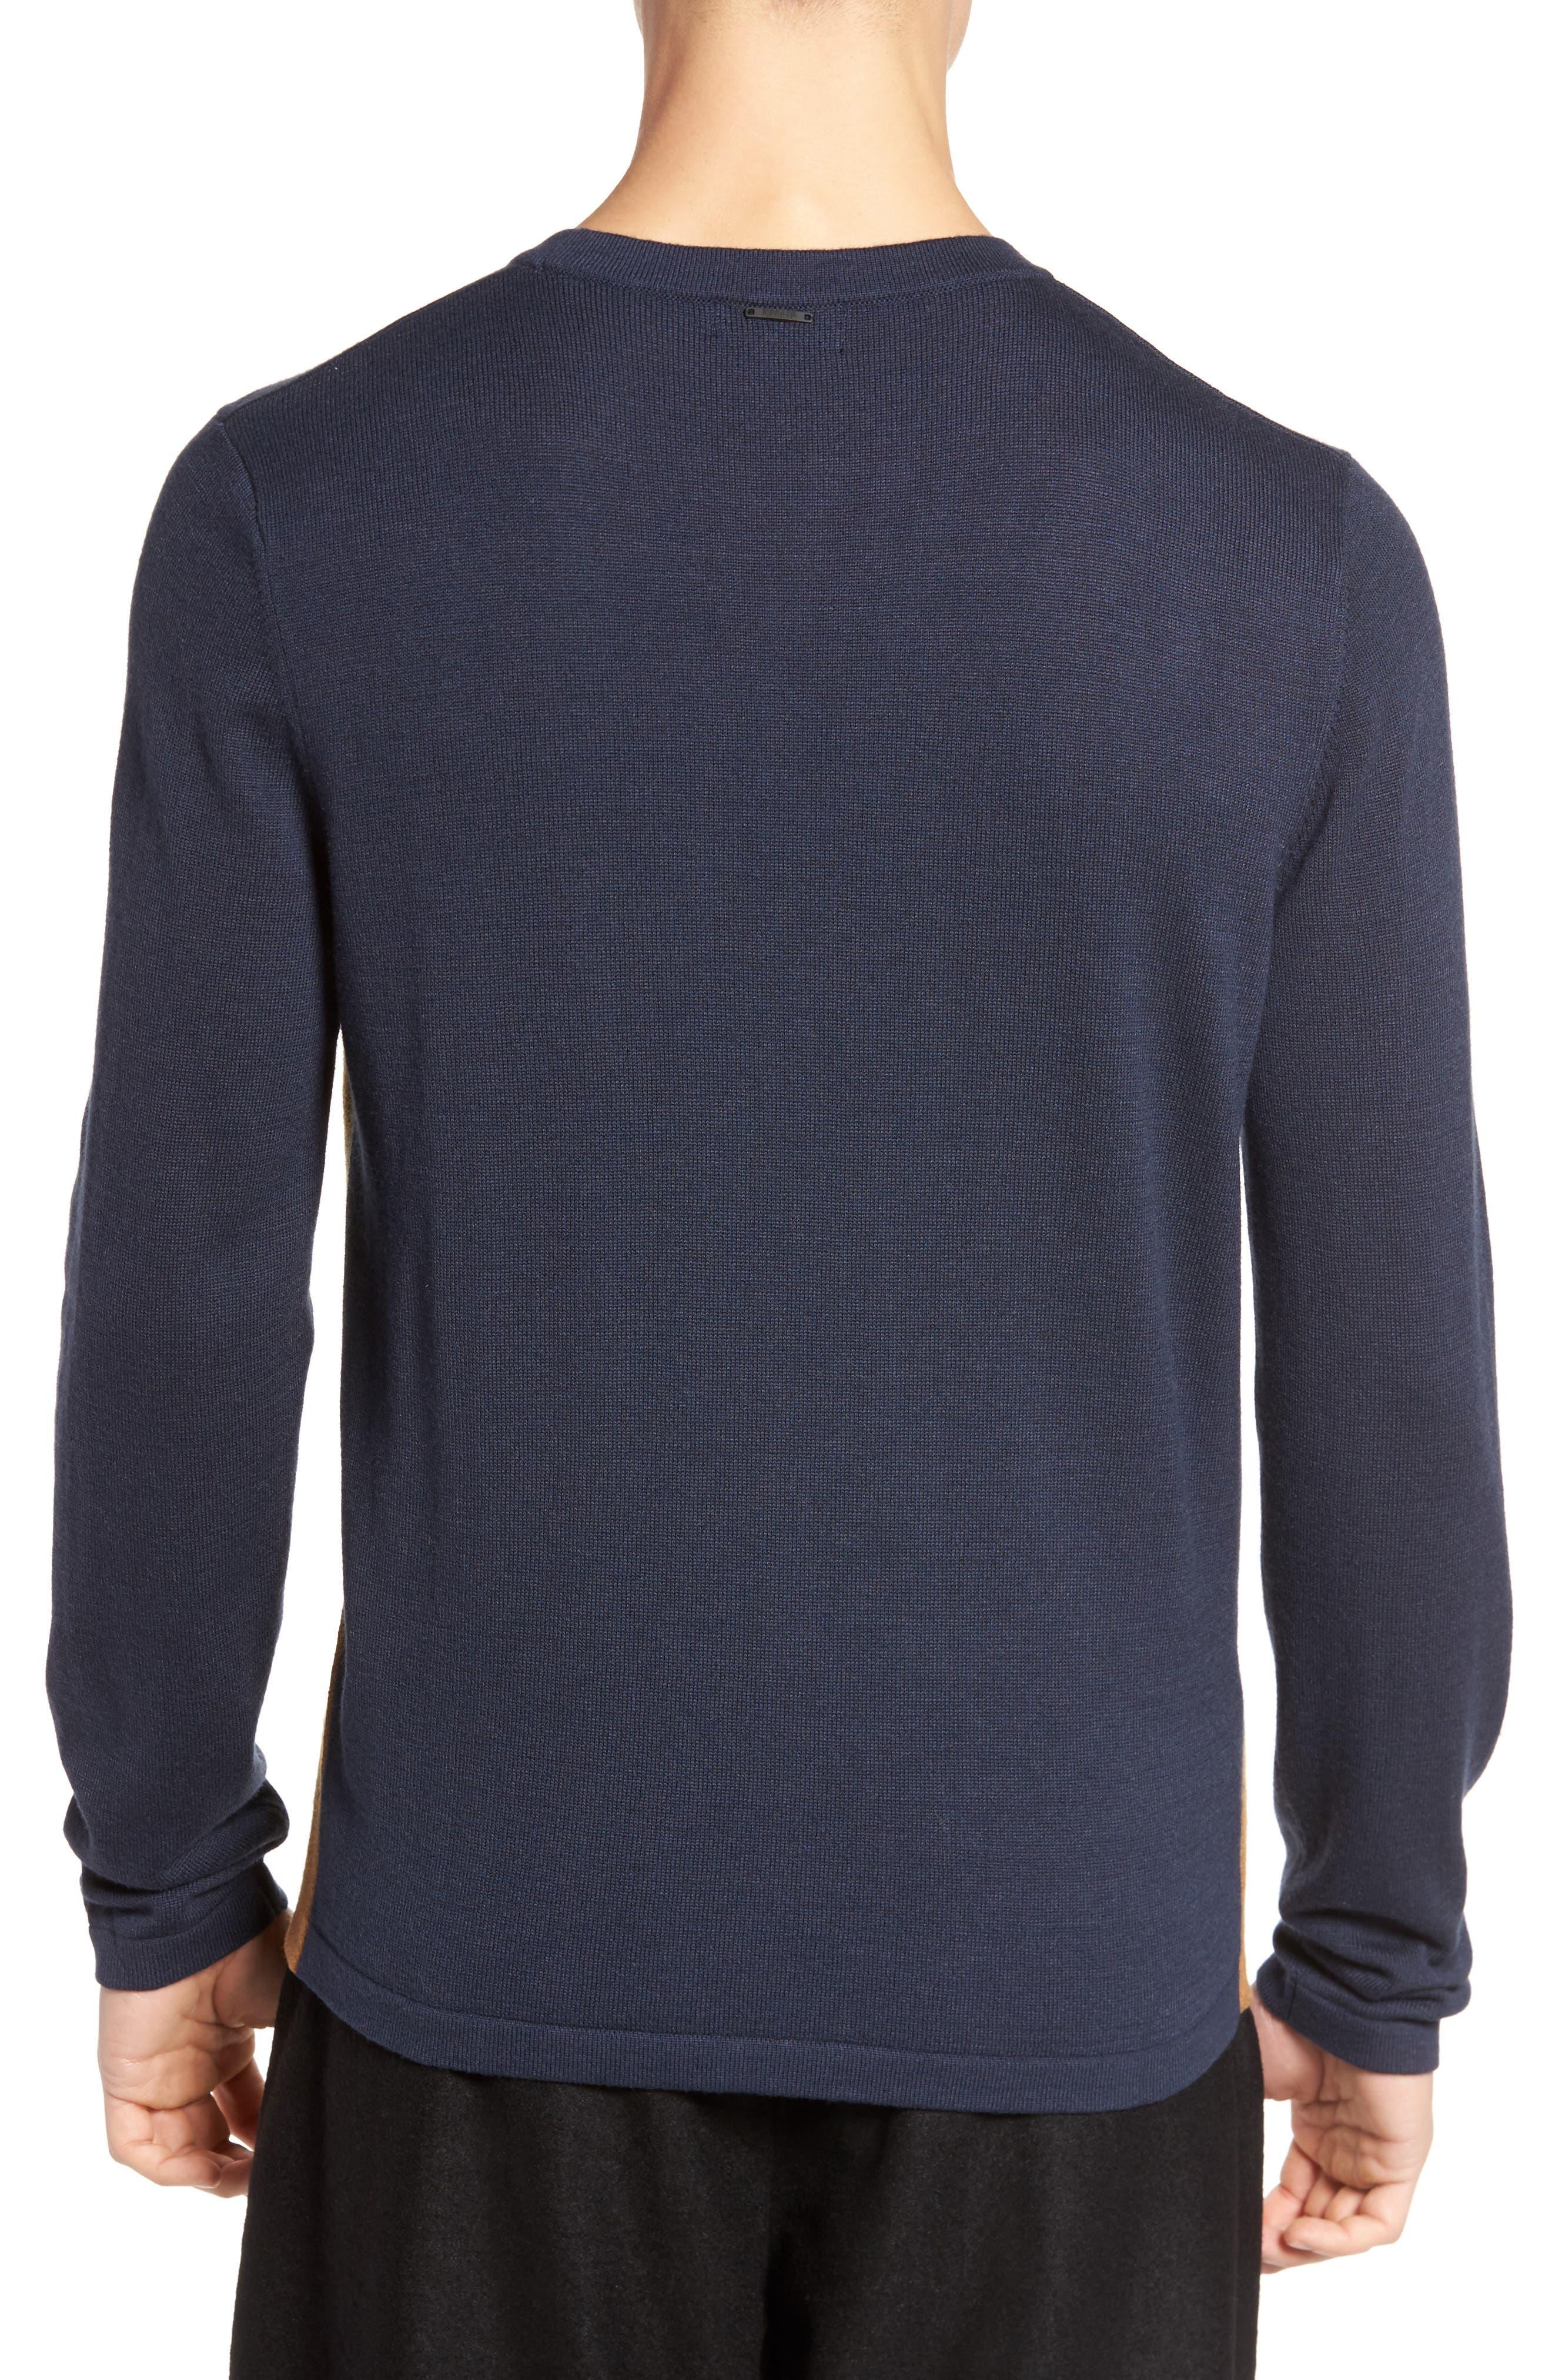 Anotny Morato Pattern Sweater,                             Alternate thumbnail 2, color,                             451